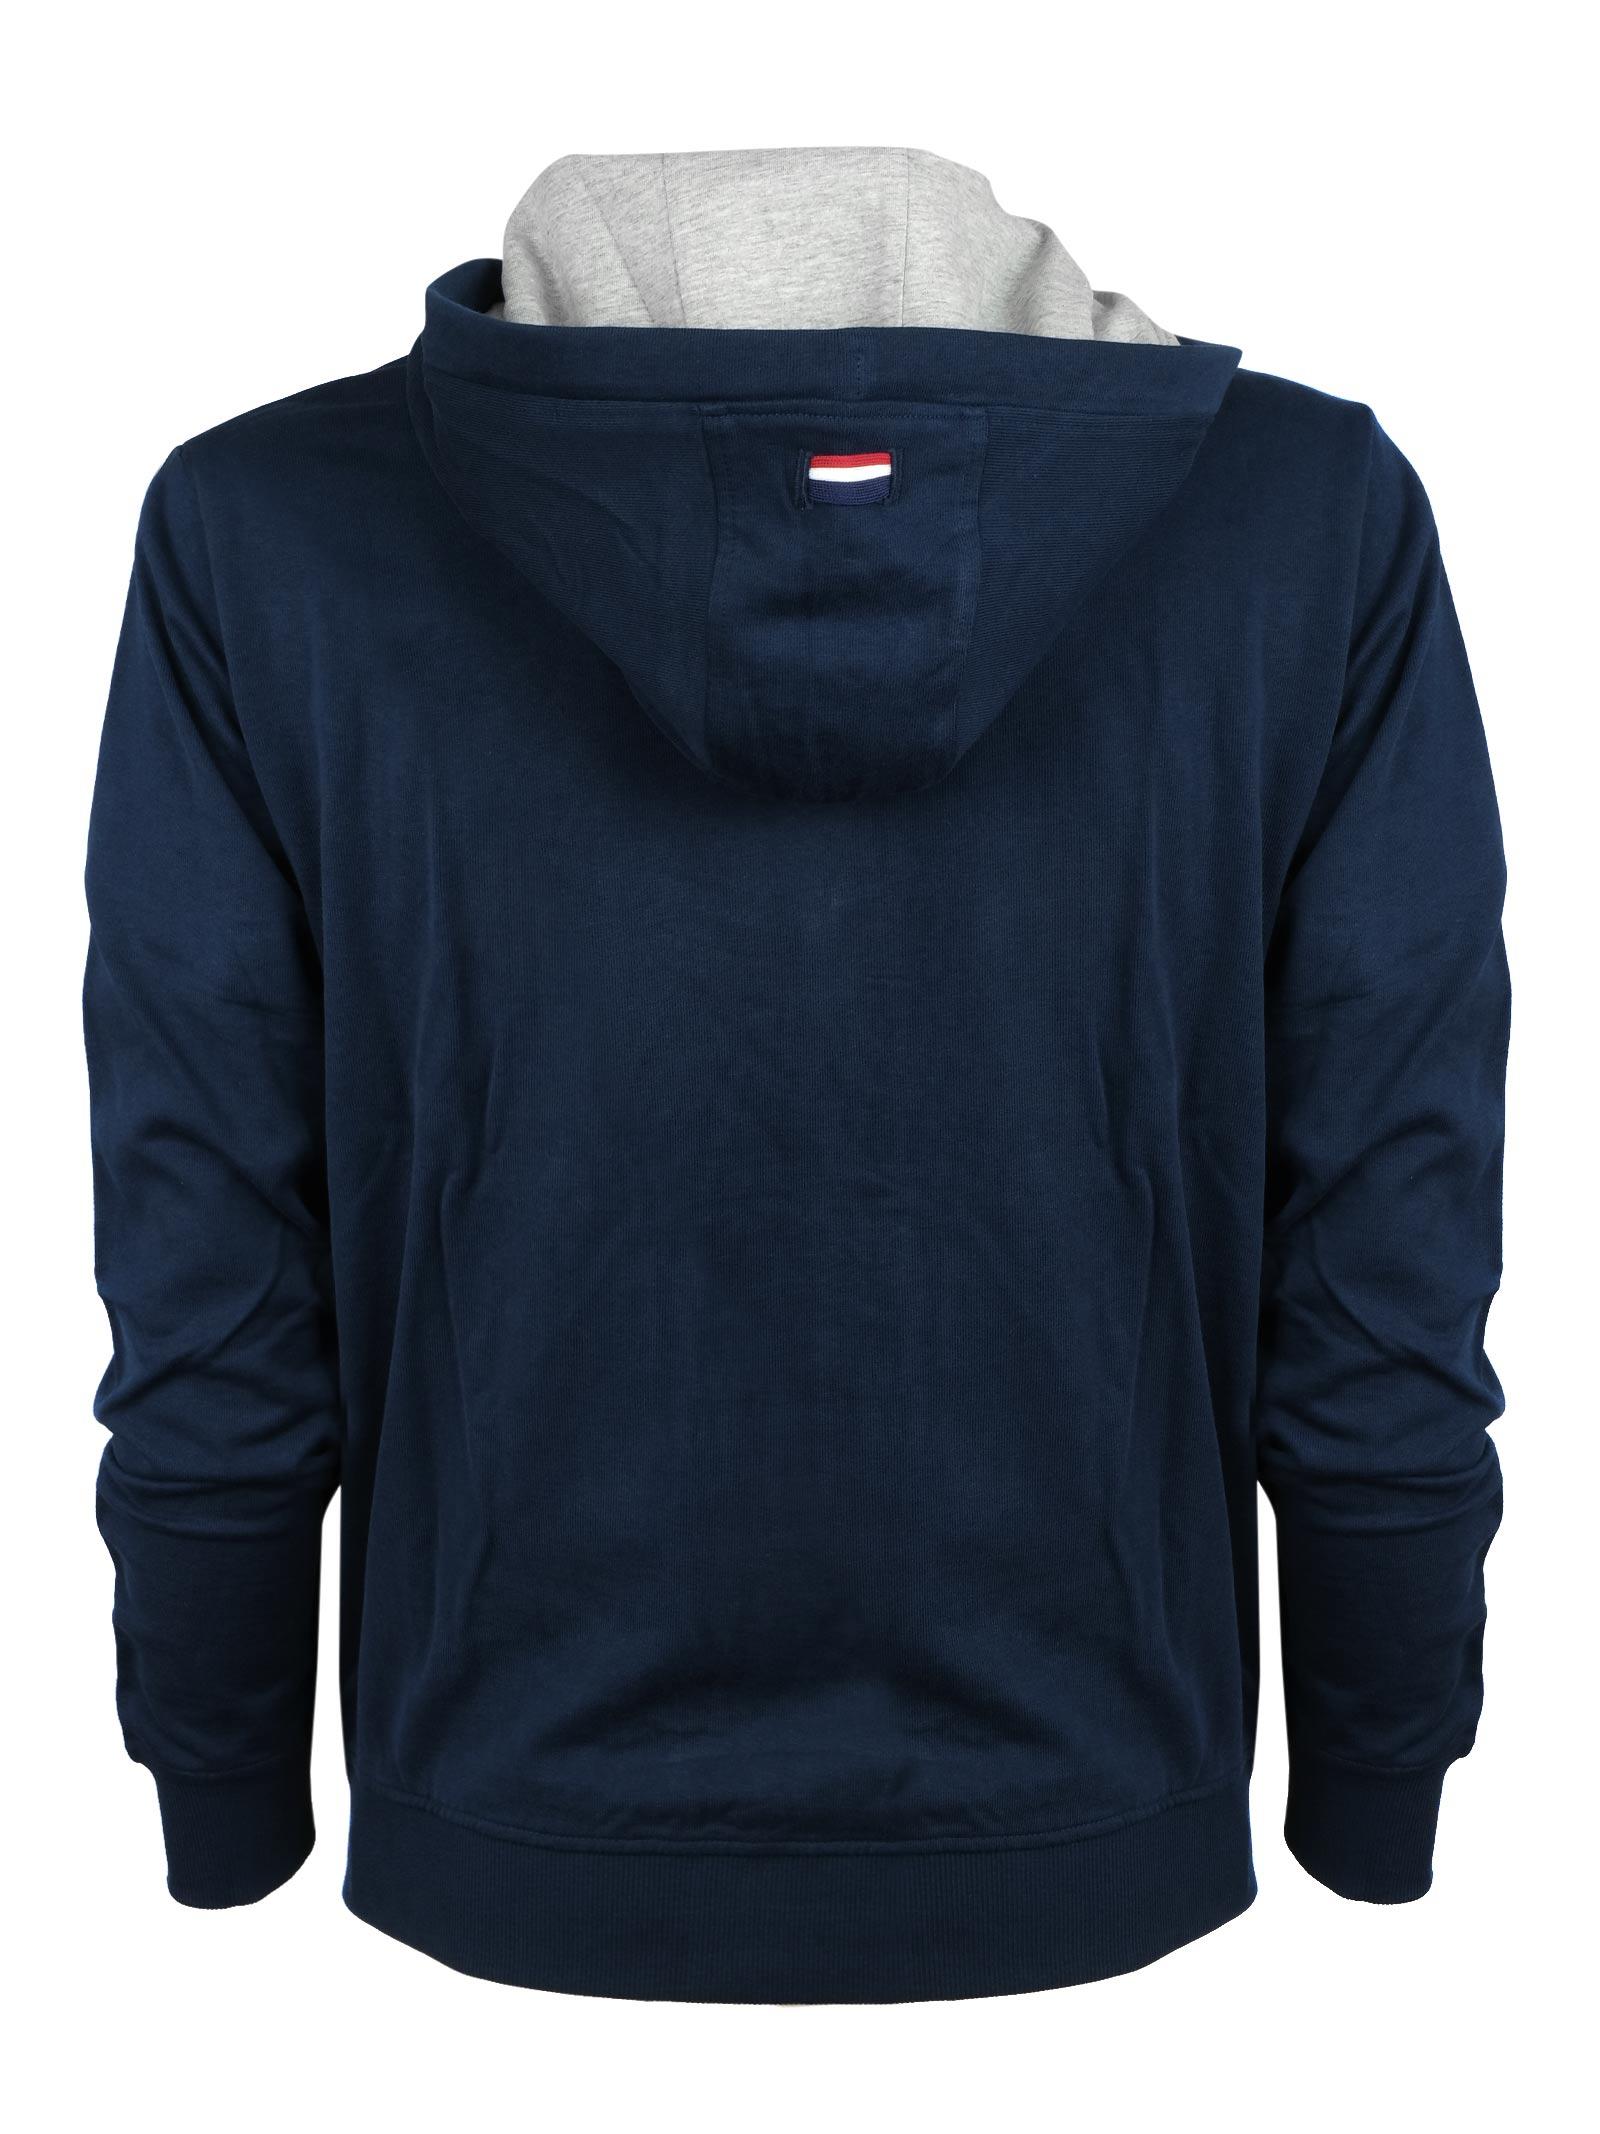 Hooded full zip sweat US POLO ASSN. | Sweats | 162 60020 52088179